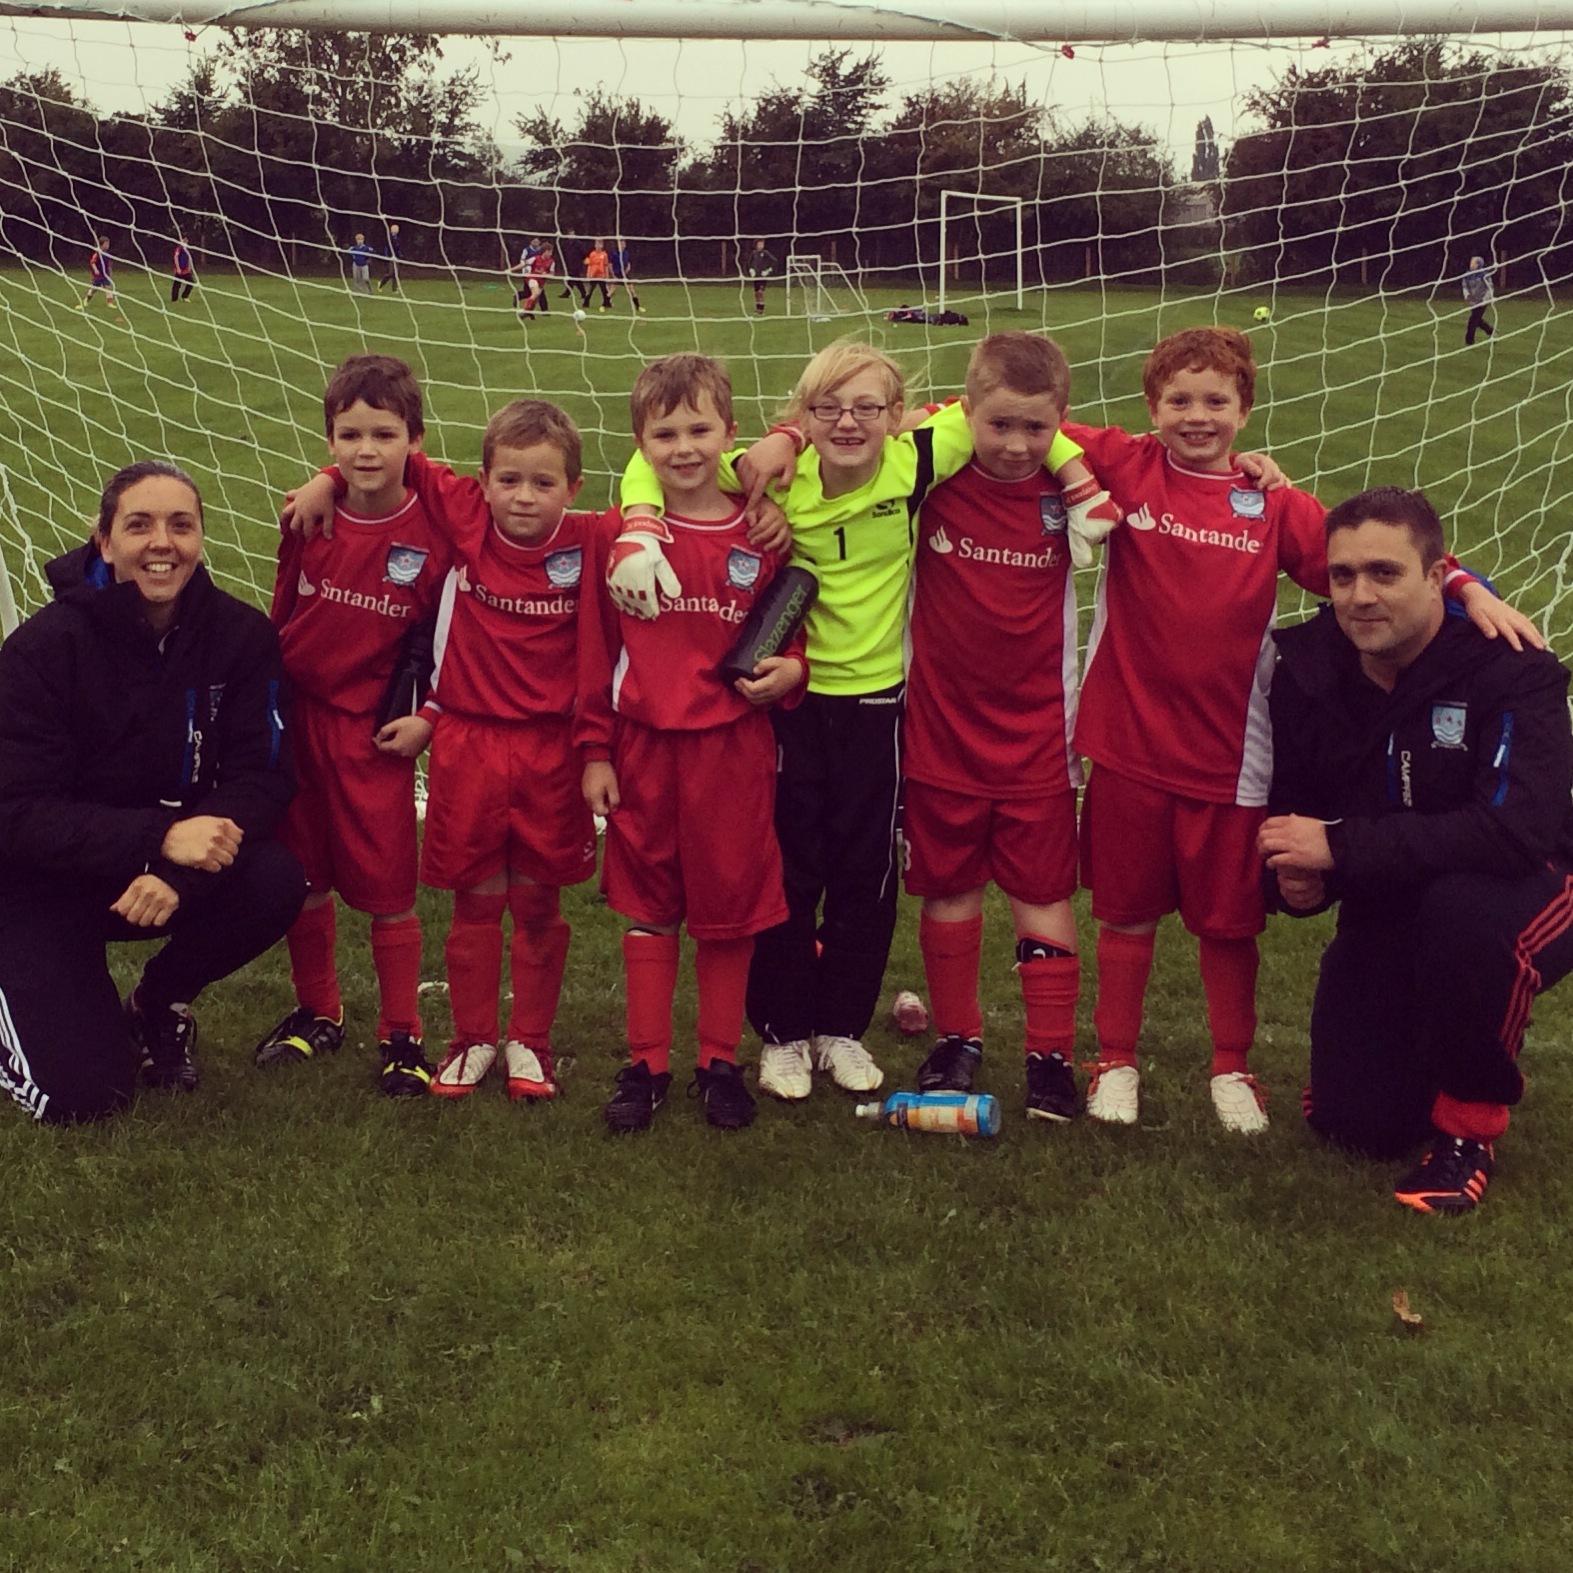 Coaching Hereford Redstars FC